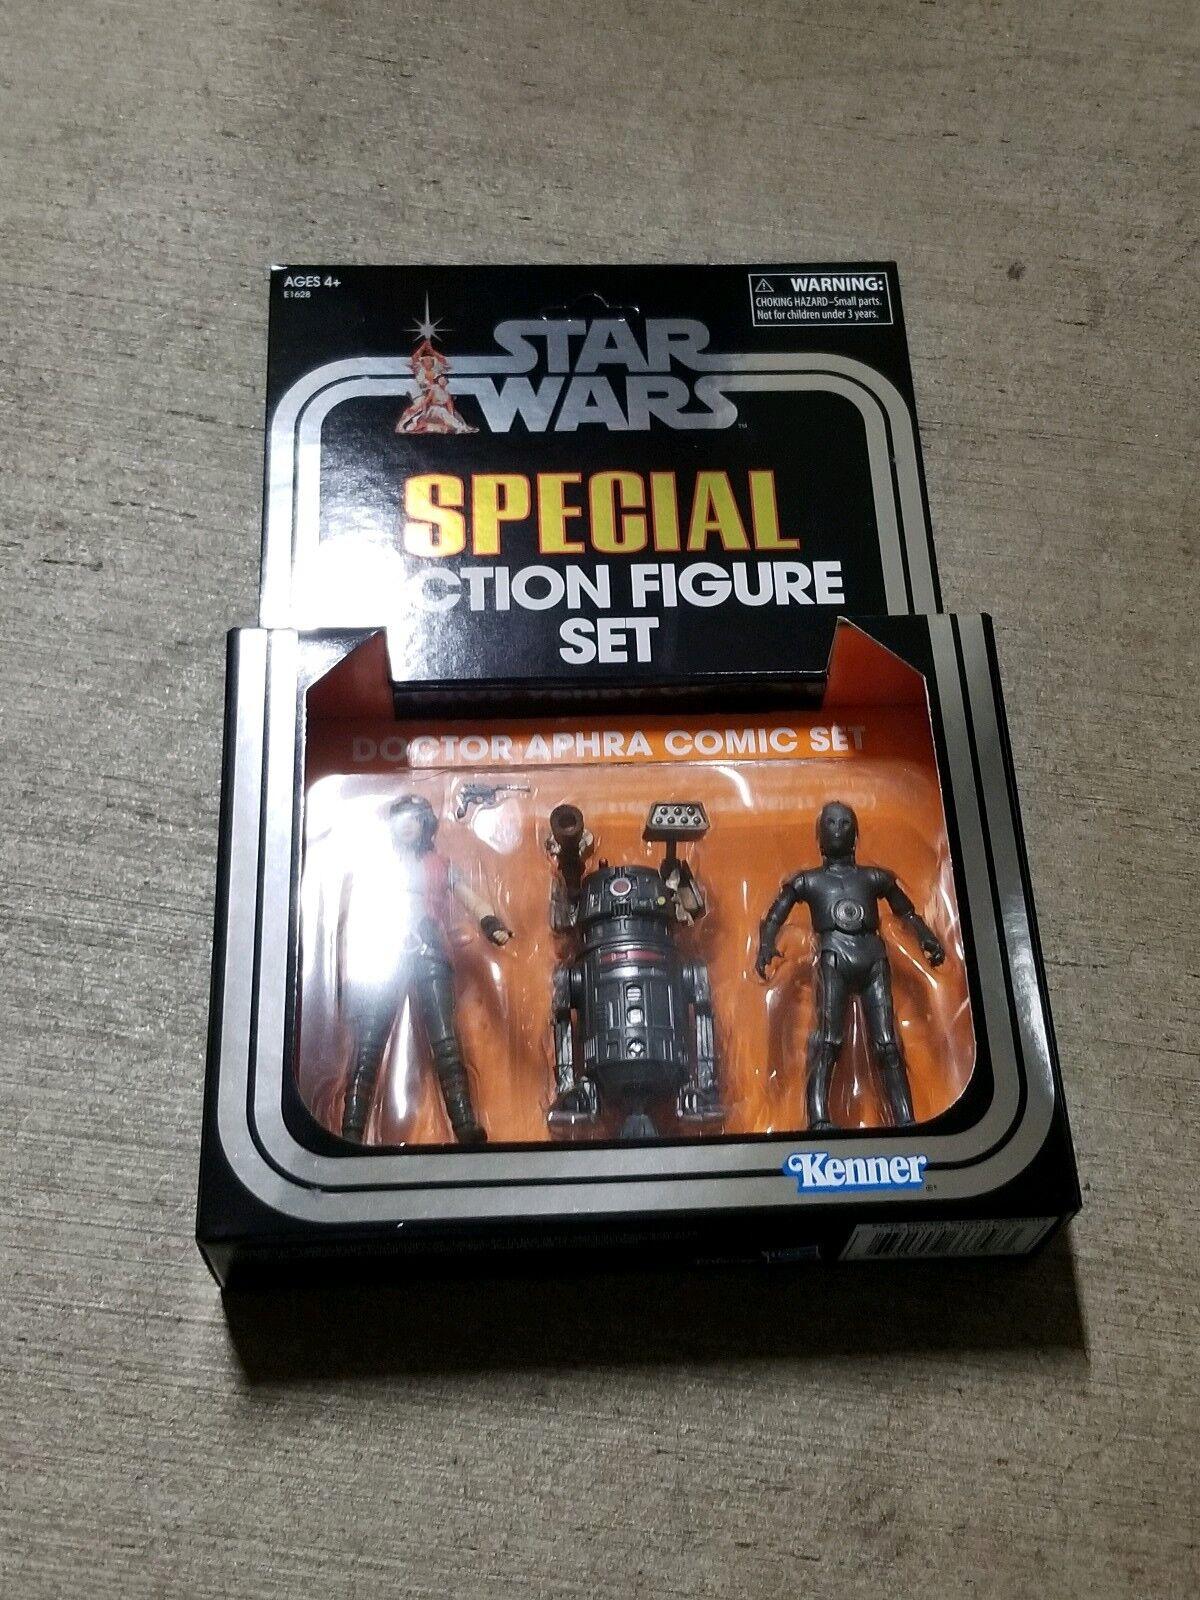 SDCC 2018 Exclusive Hasbro Star Wars Vintage Collection Doctor Aphra Comic Set